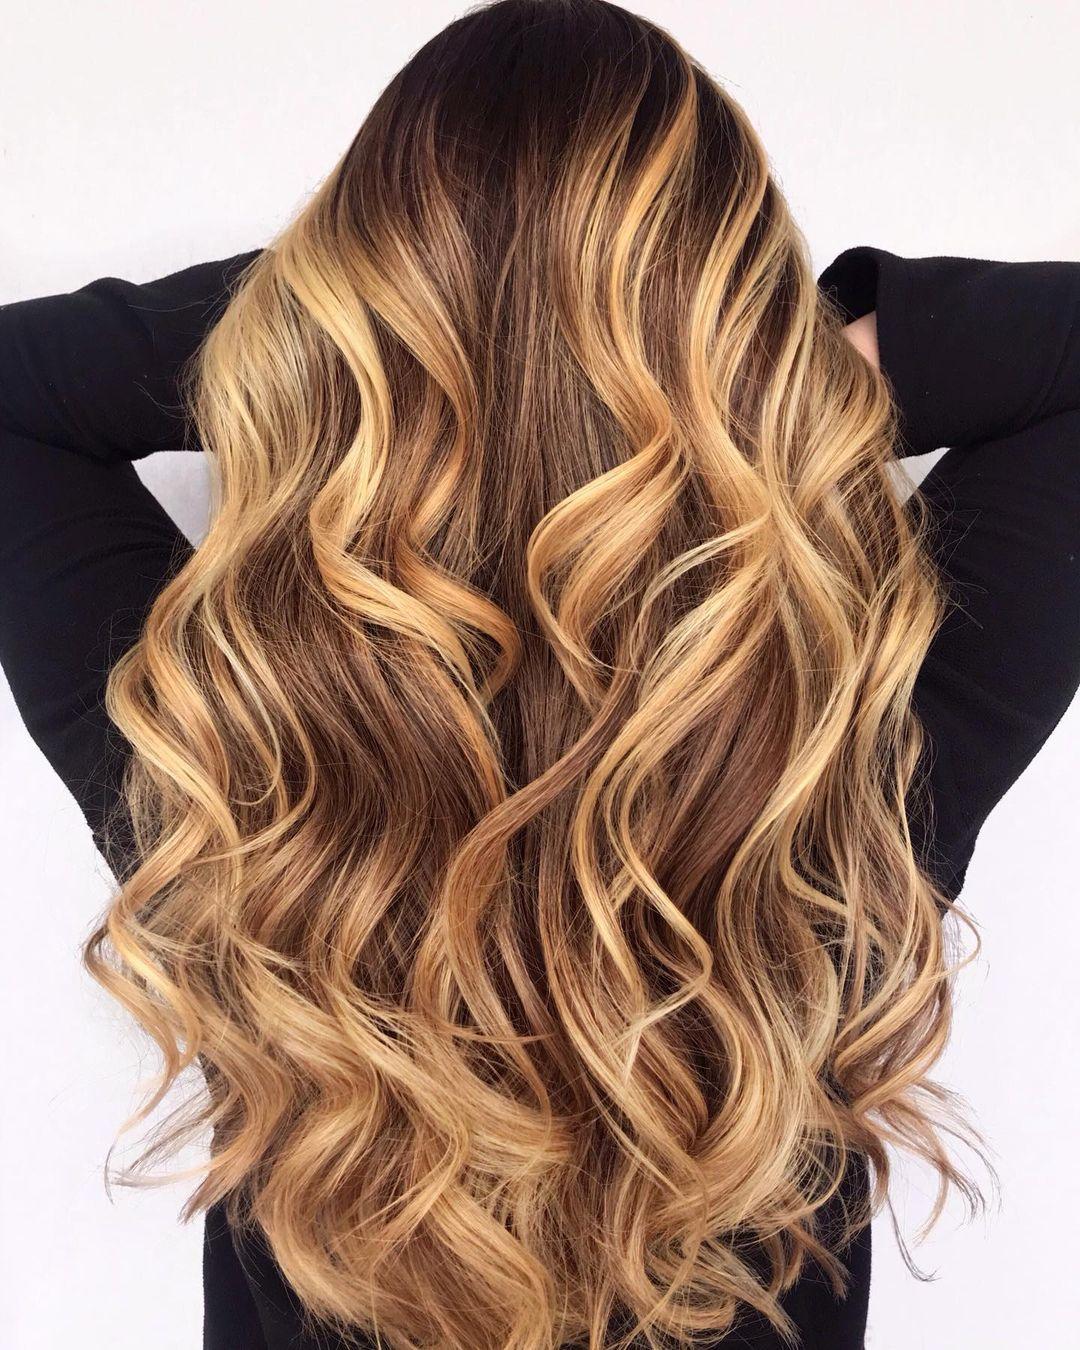 Long Layered Golden Bronde Balayage Hair